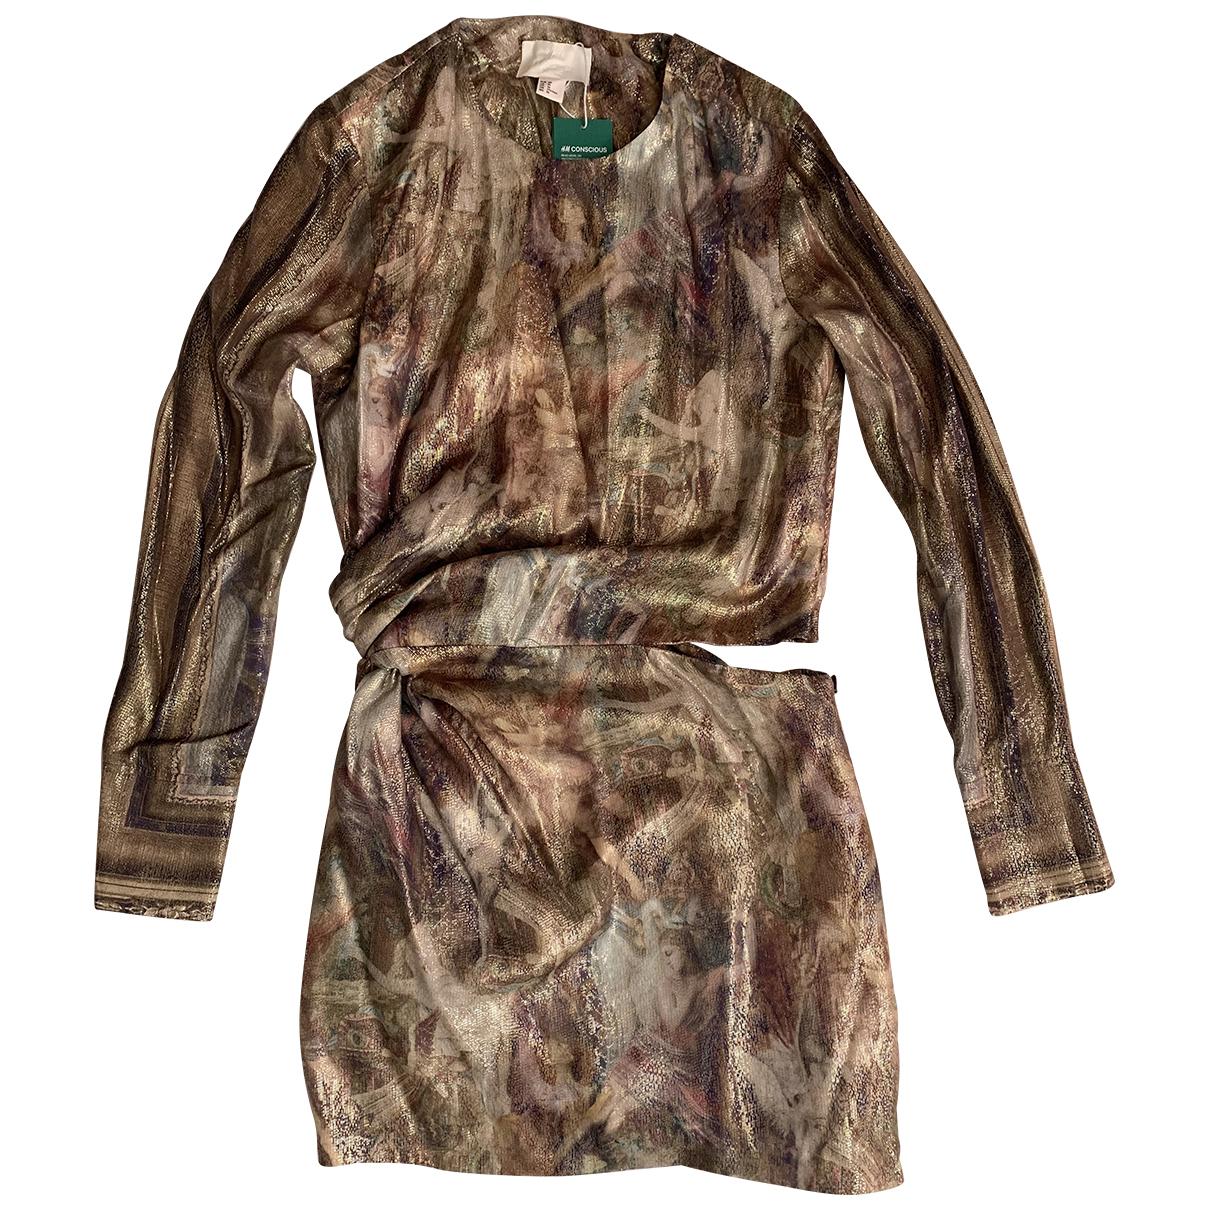 H&m Conscious Exclusive \N Kleid in  Gold Seide